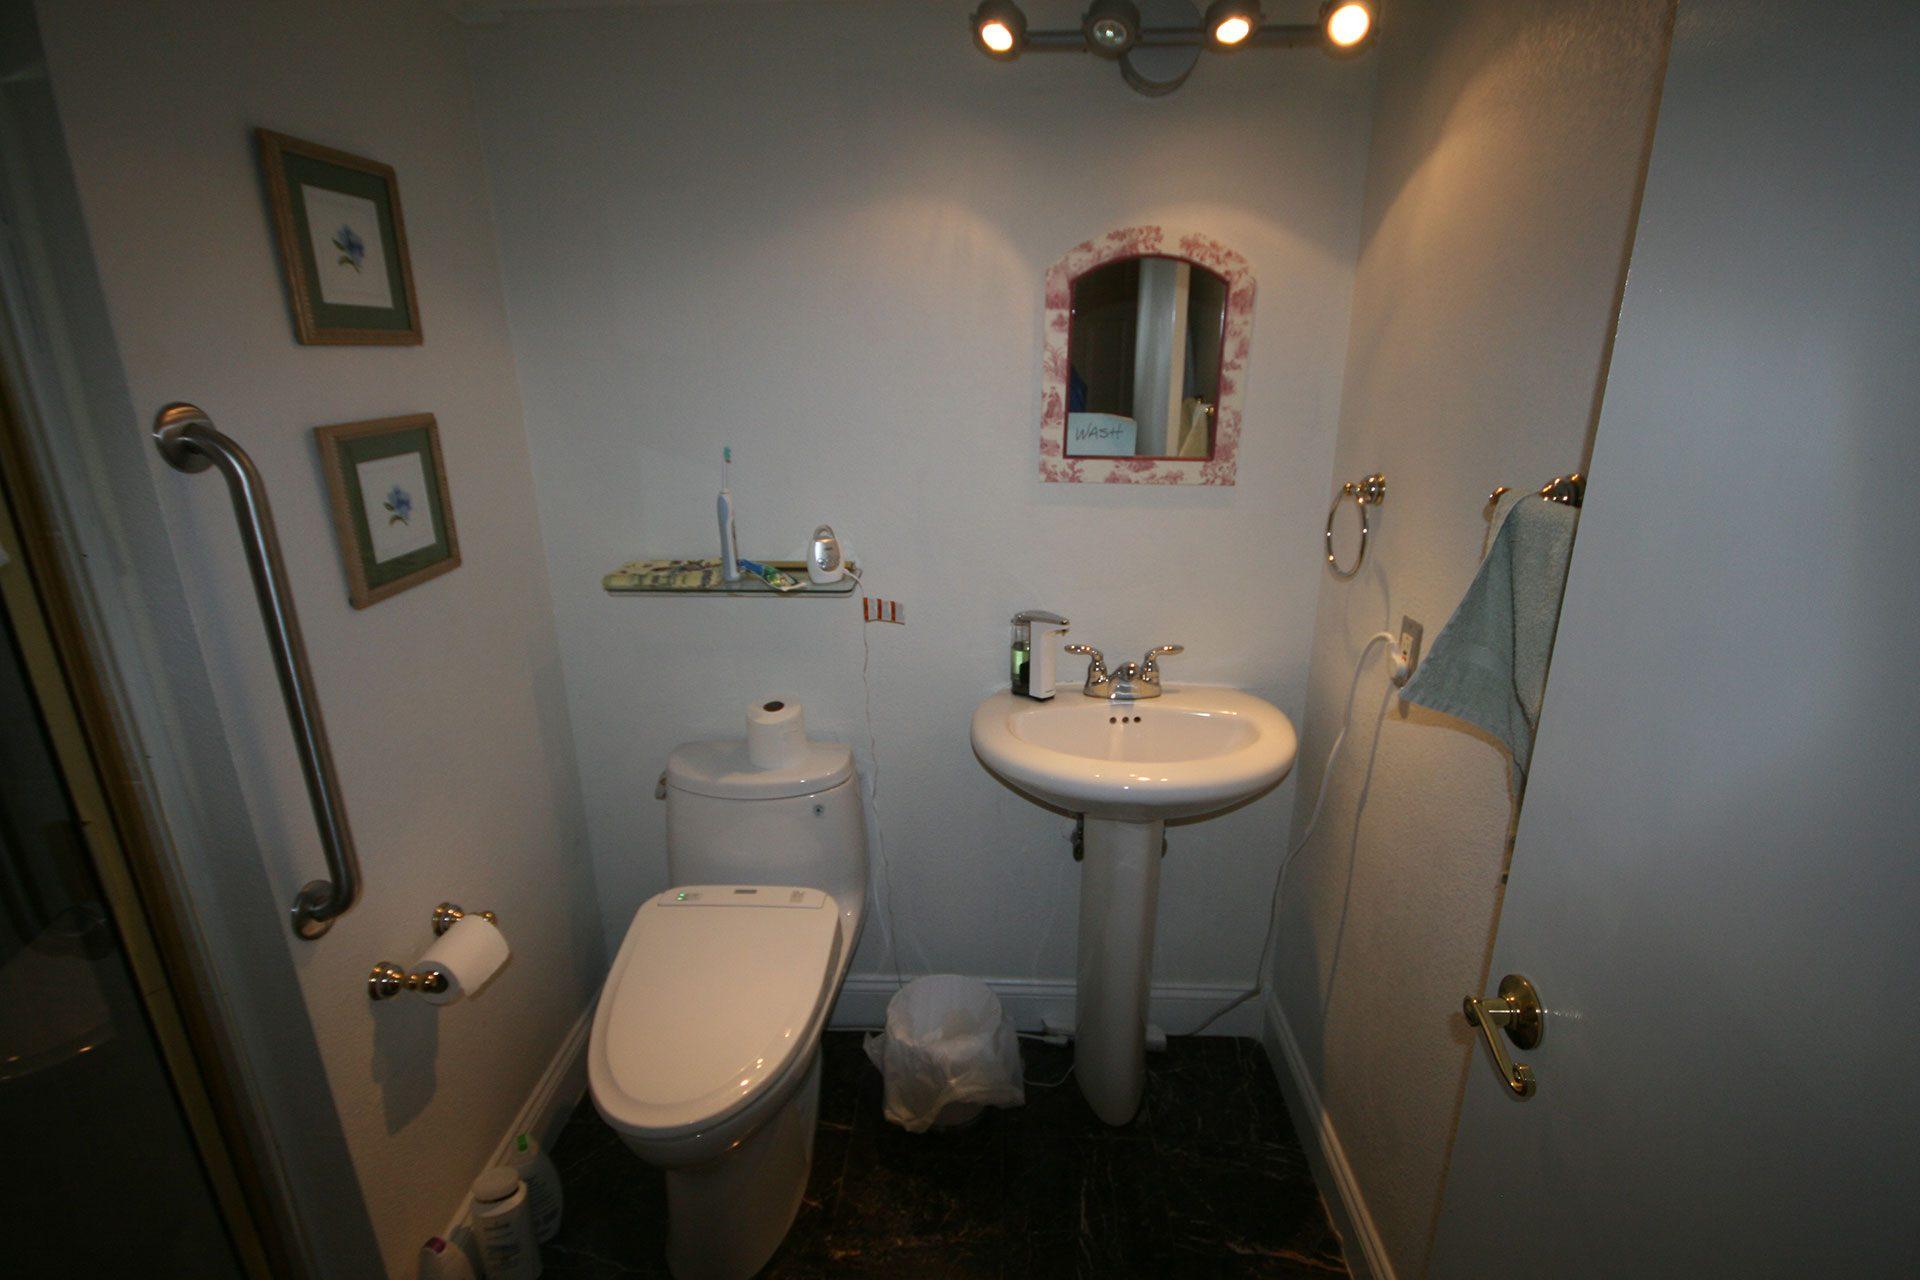 dimly lit bathroom